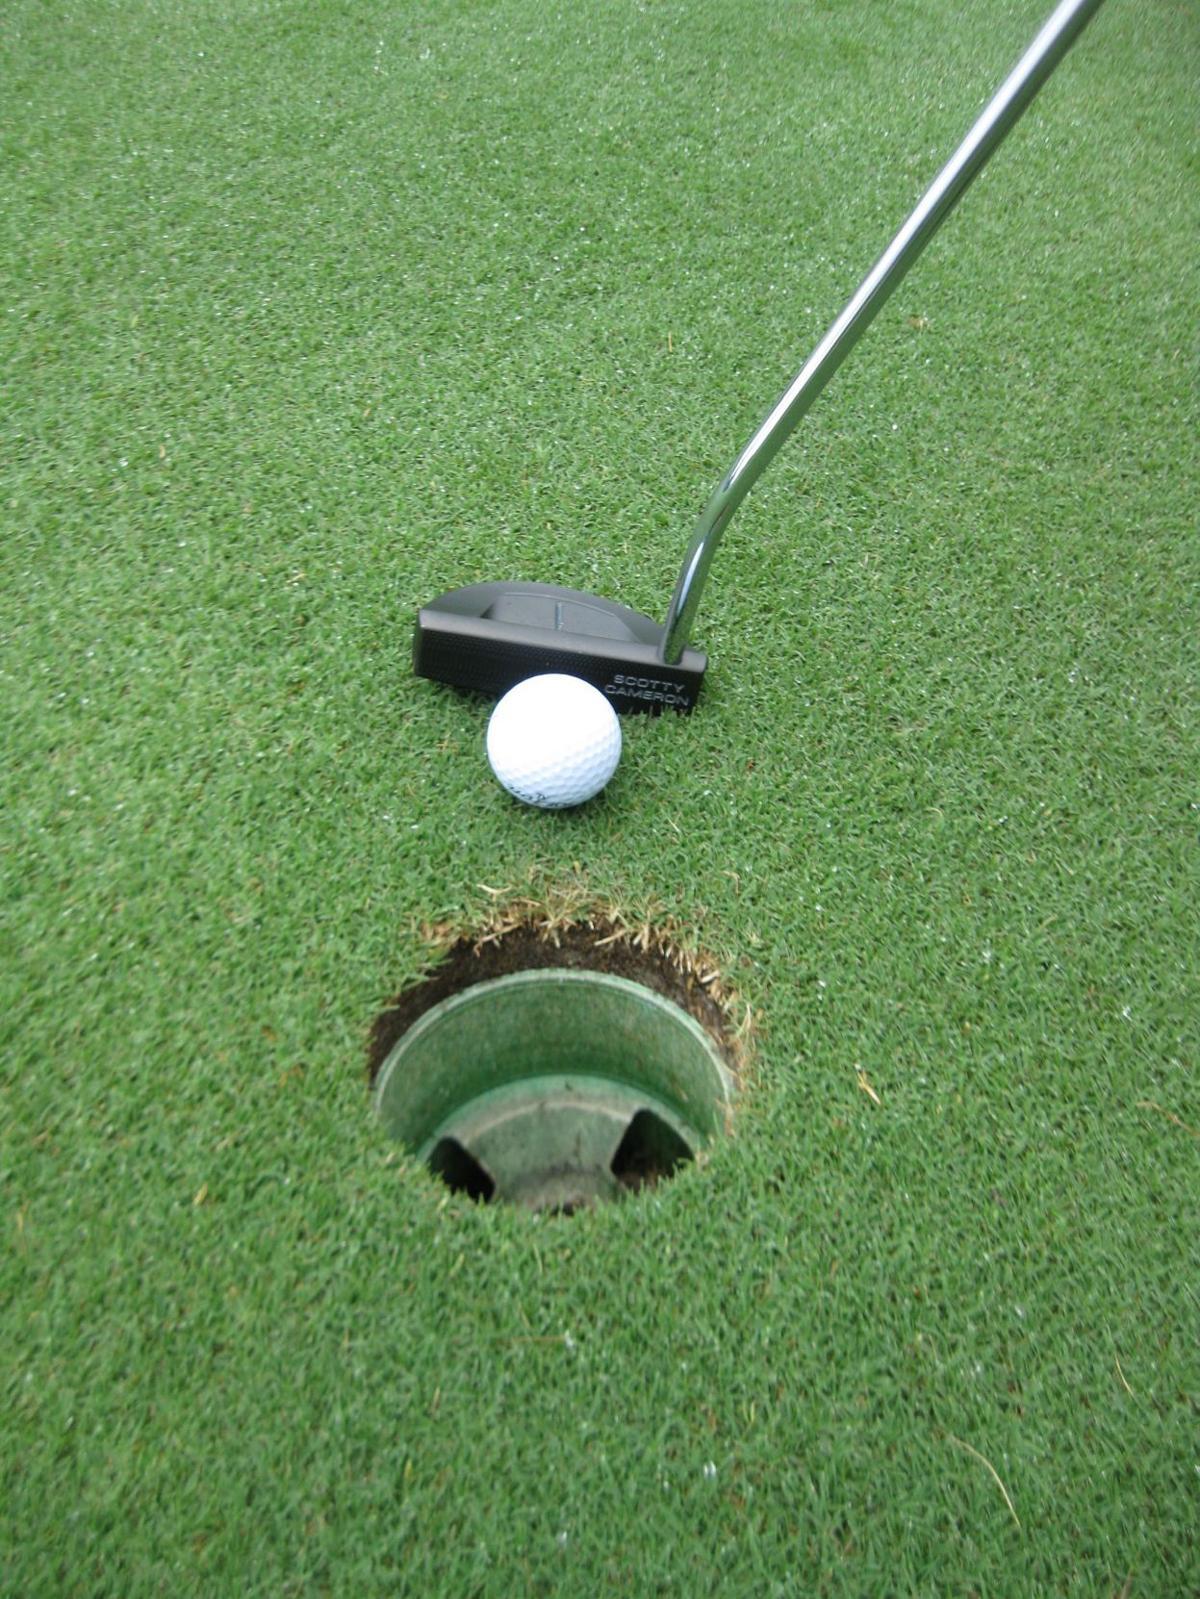 April 26 Golf Calendar and Aces